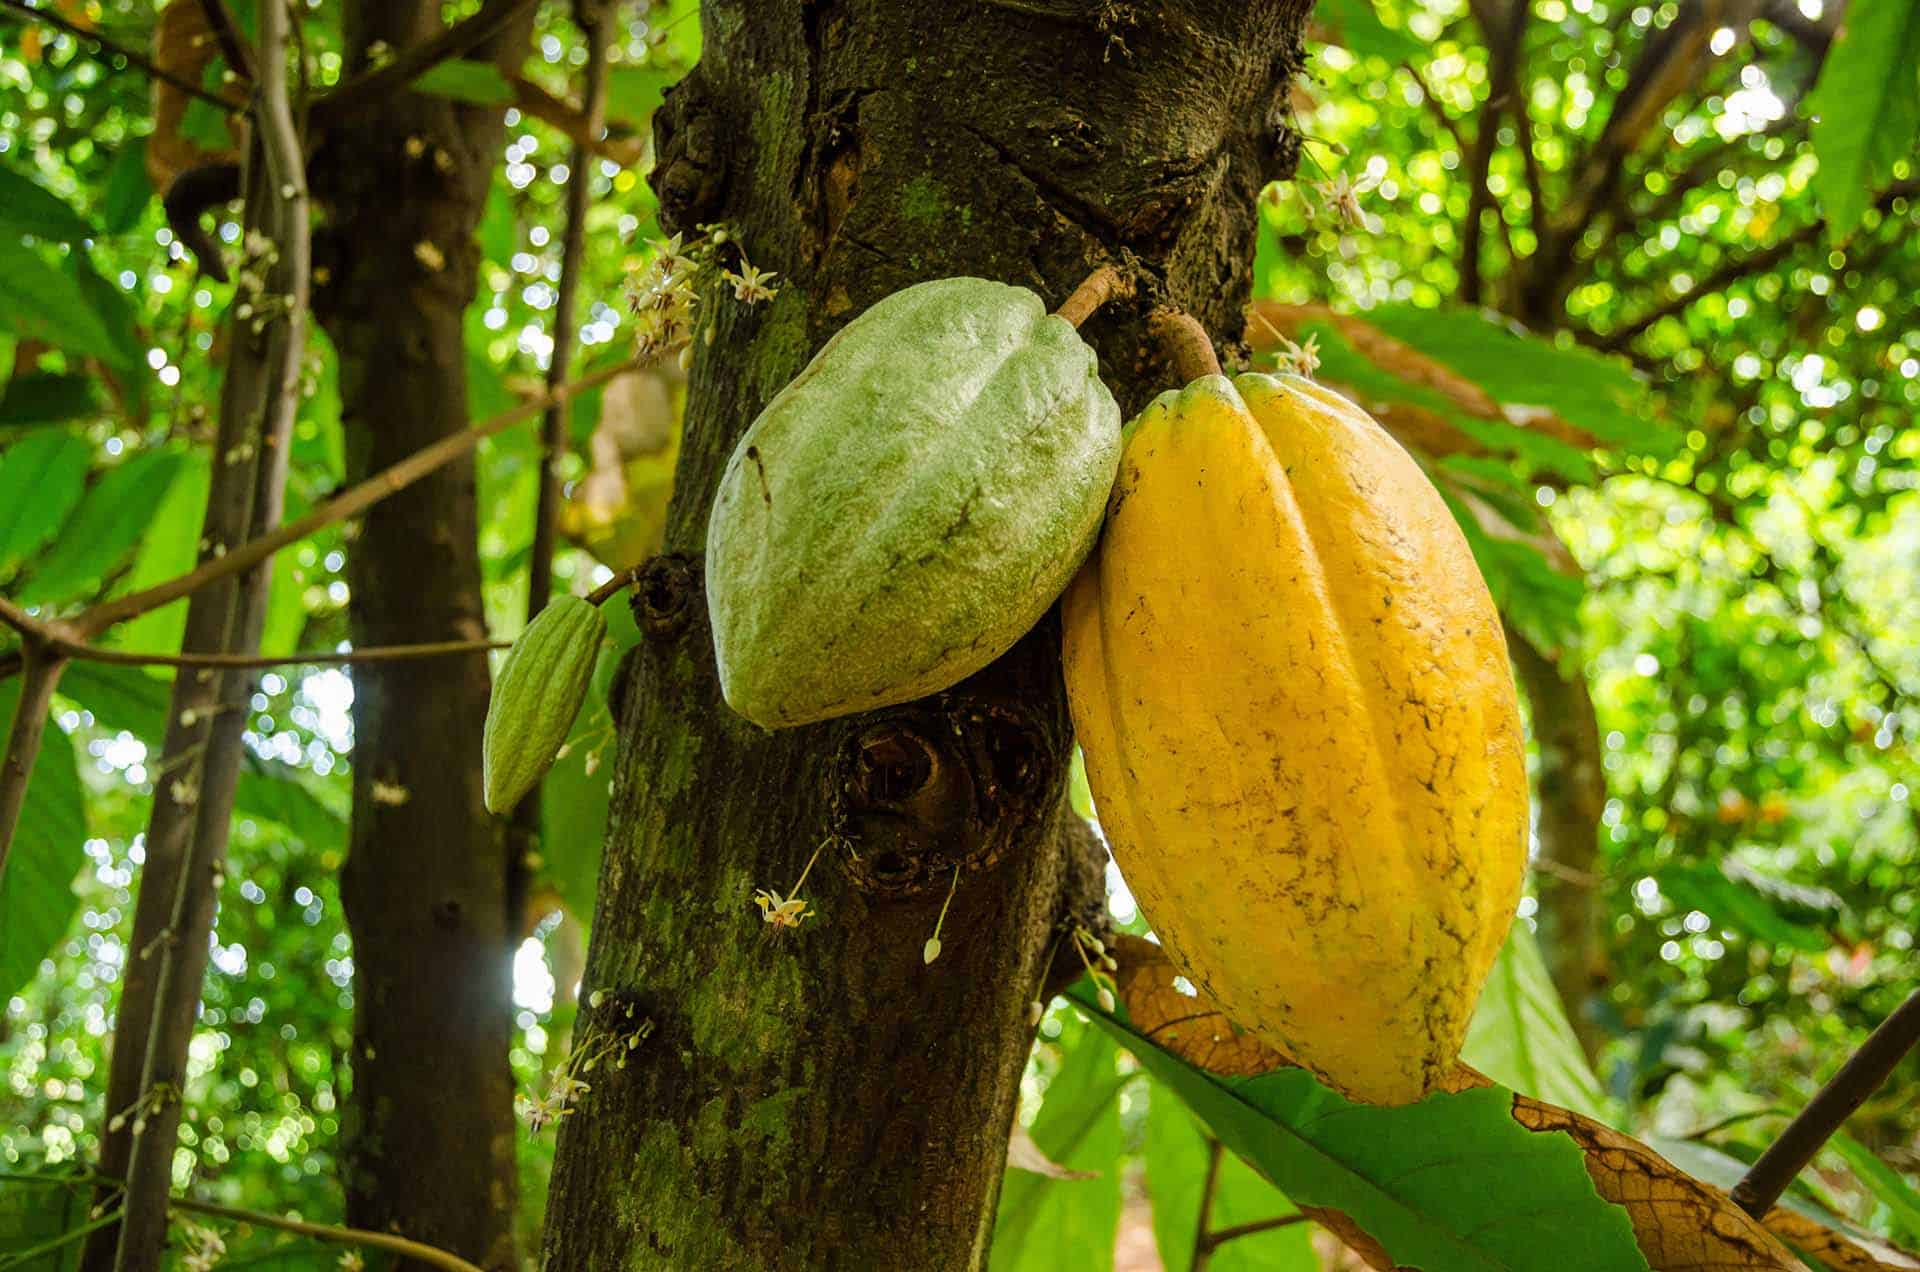 baracoa plante cacao cuba autrement